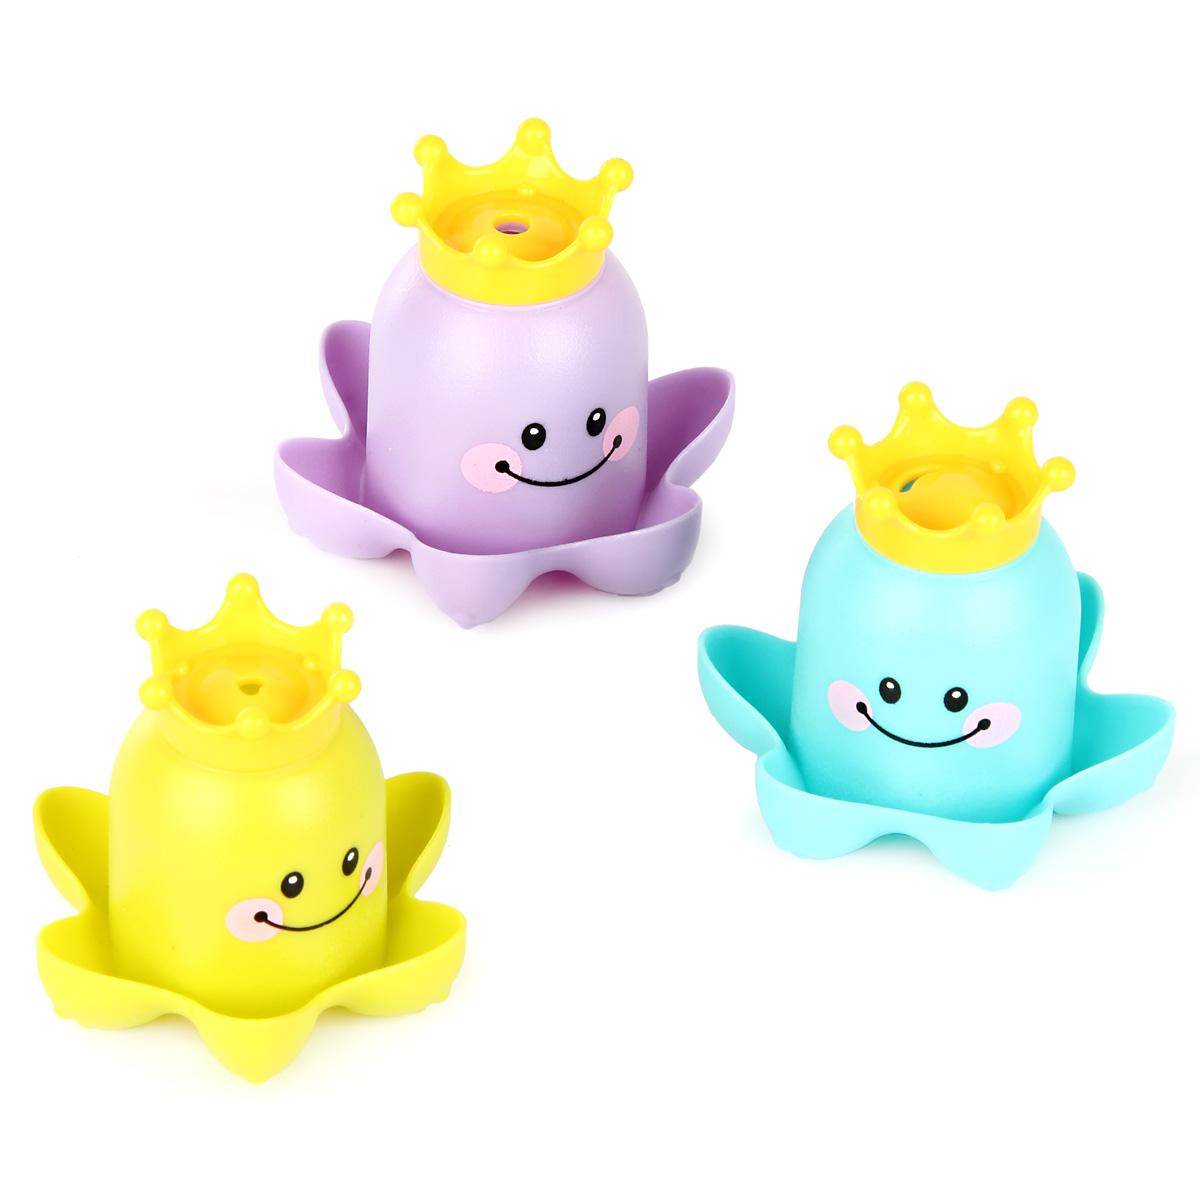 Игрушки для ванной Ути Пути Морские обитатели игрушки для ванны babymoov игрушка для купания кубики а104925